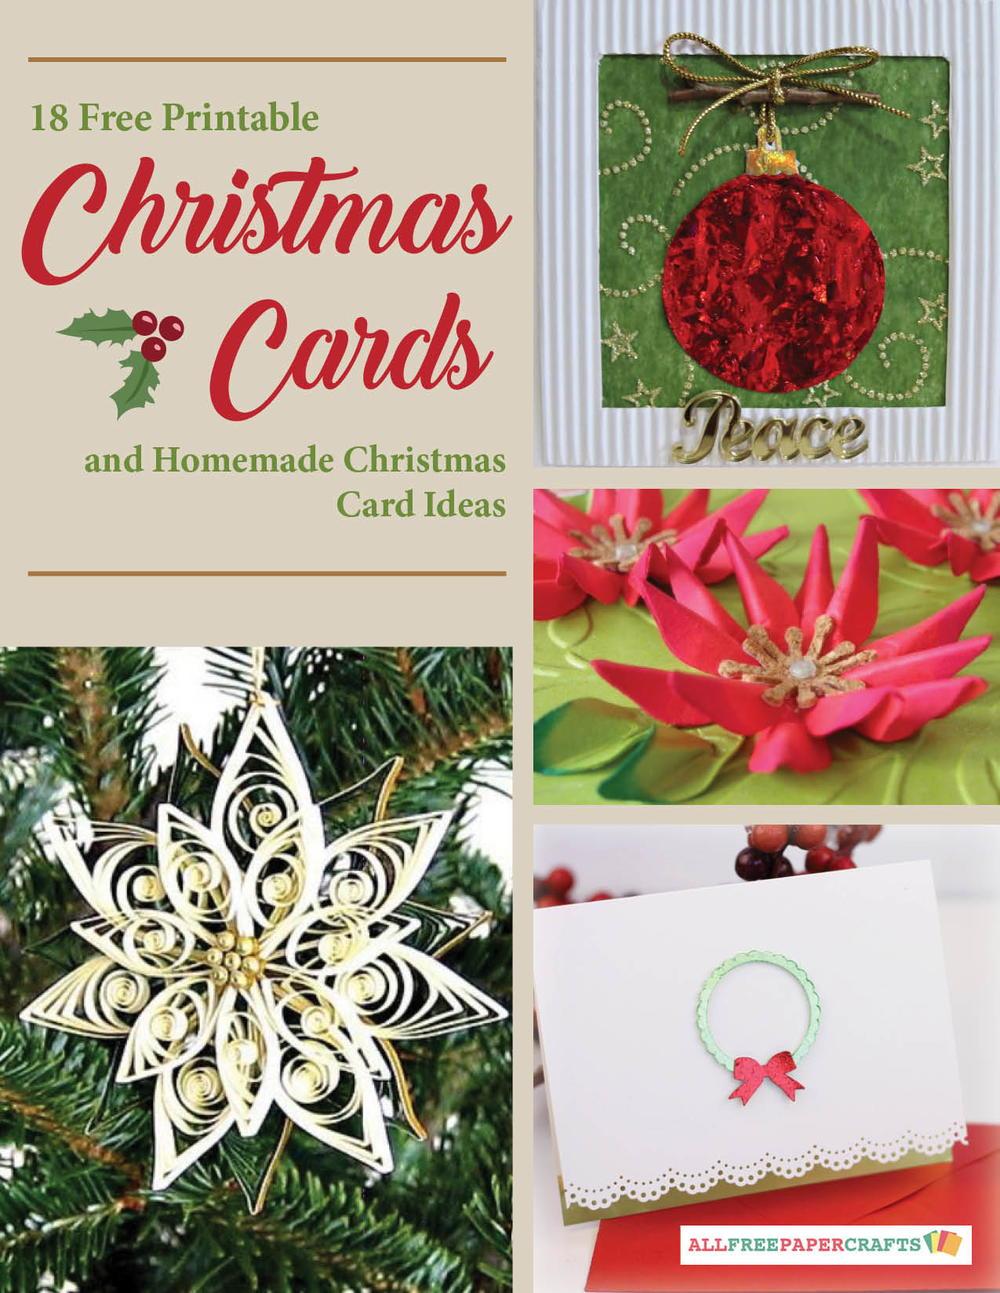 Card Making Ideas Christmas Part - 20: 18 Free Printable Christmas Cards And Homemade Christmas Card Ideas |  AllFreePaperCrafts.com